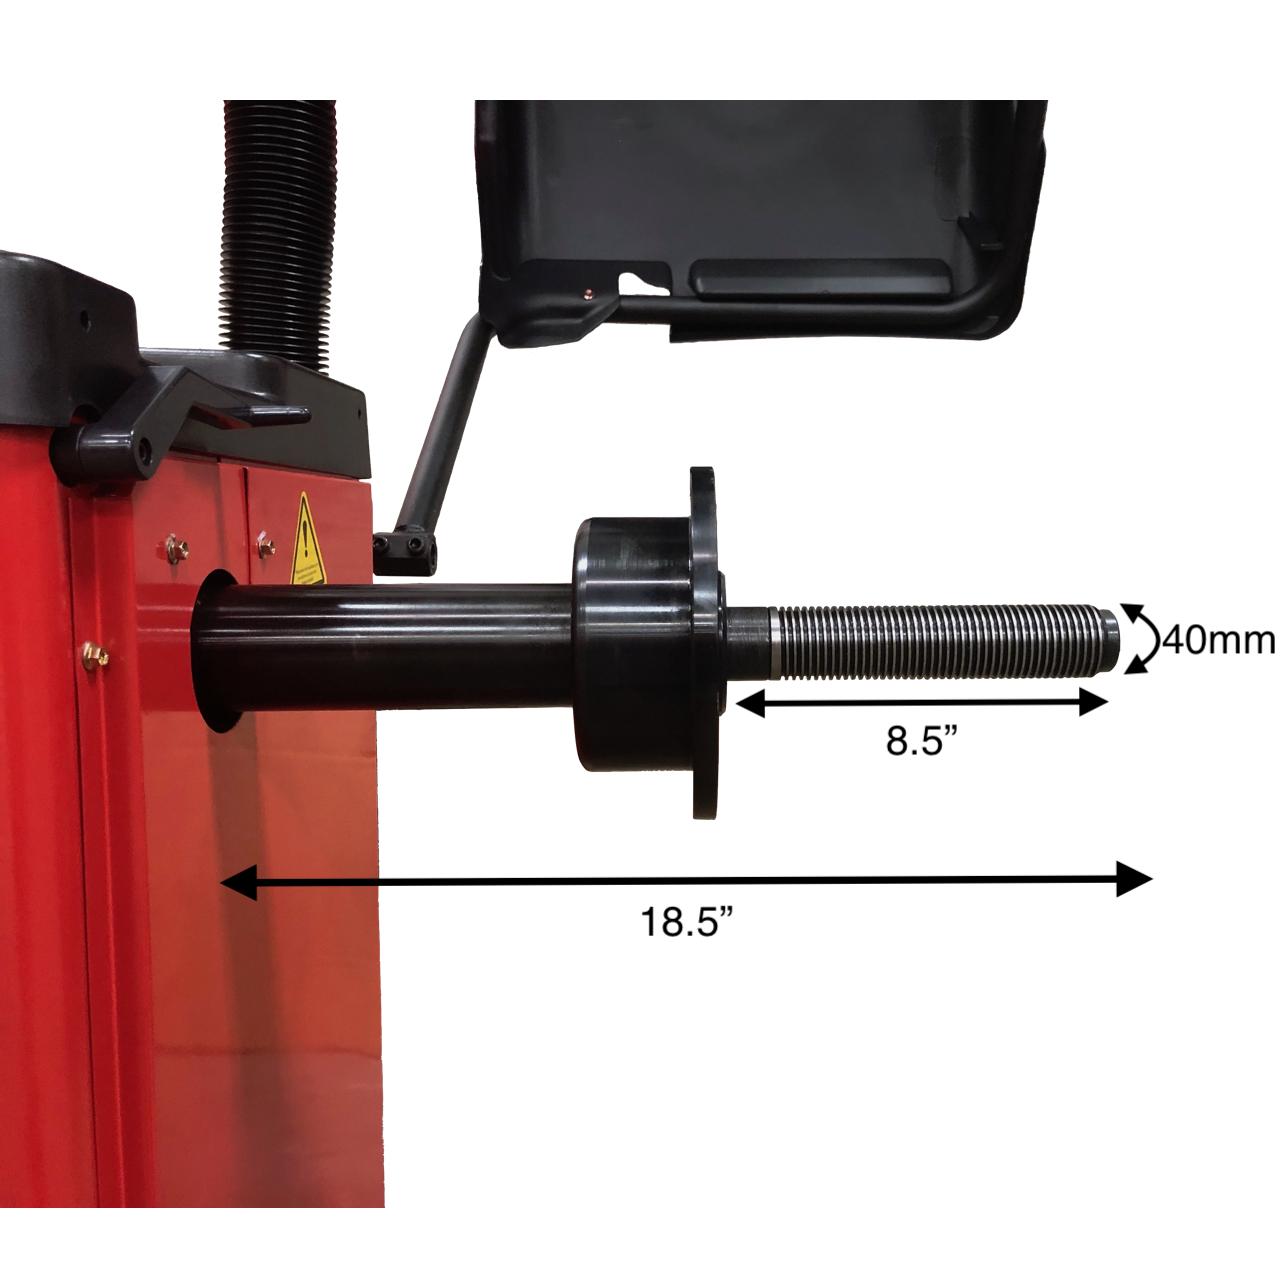 Weaver W-957-40 Wheel Balancer Shaft Measurements